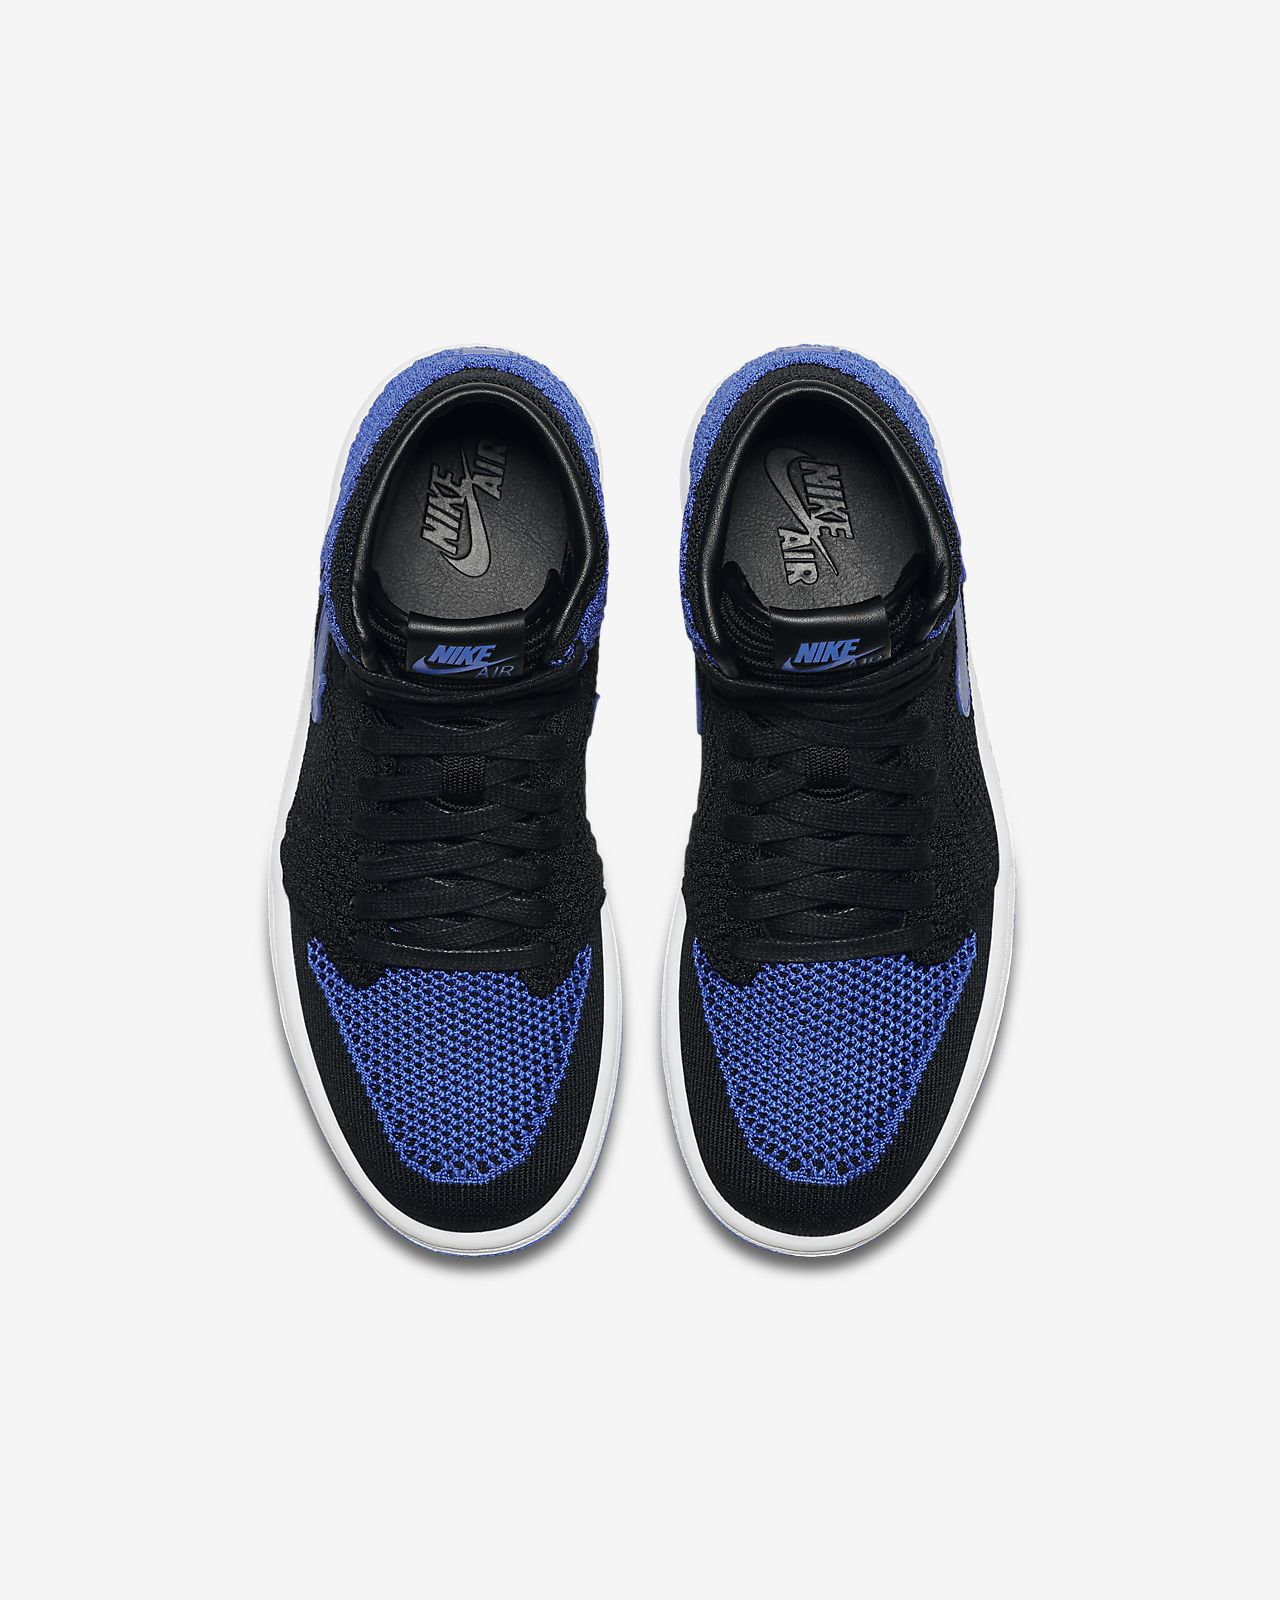 9a02d5cf9c22 Air Jordan 1 Retro High Flyknit Older Kids  Shoe. Nike.com CA